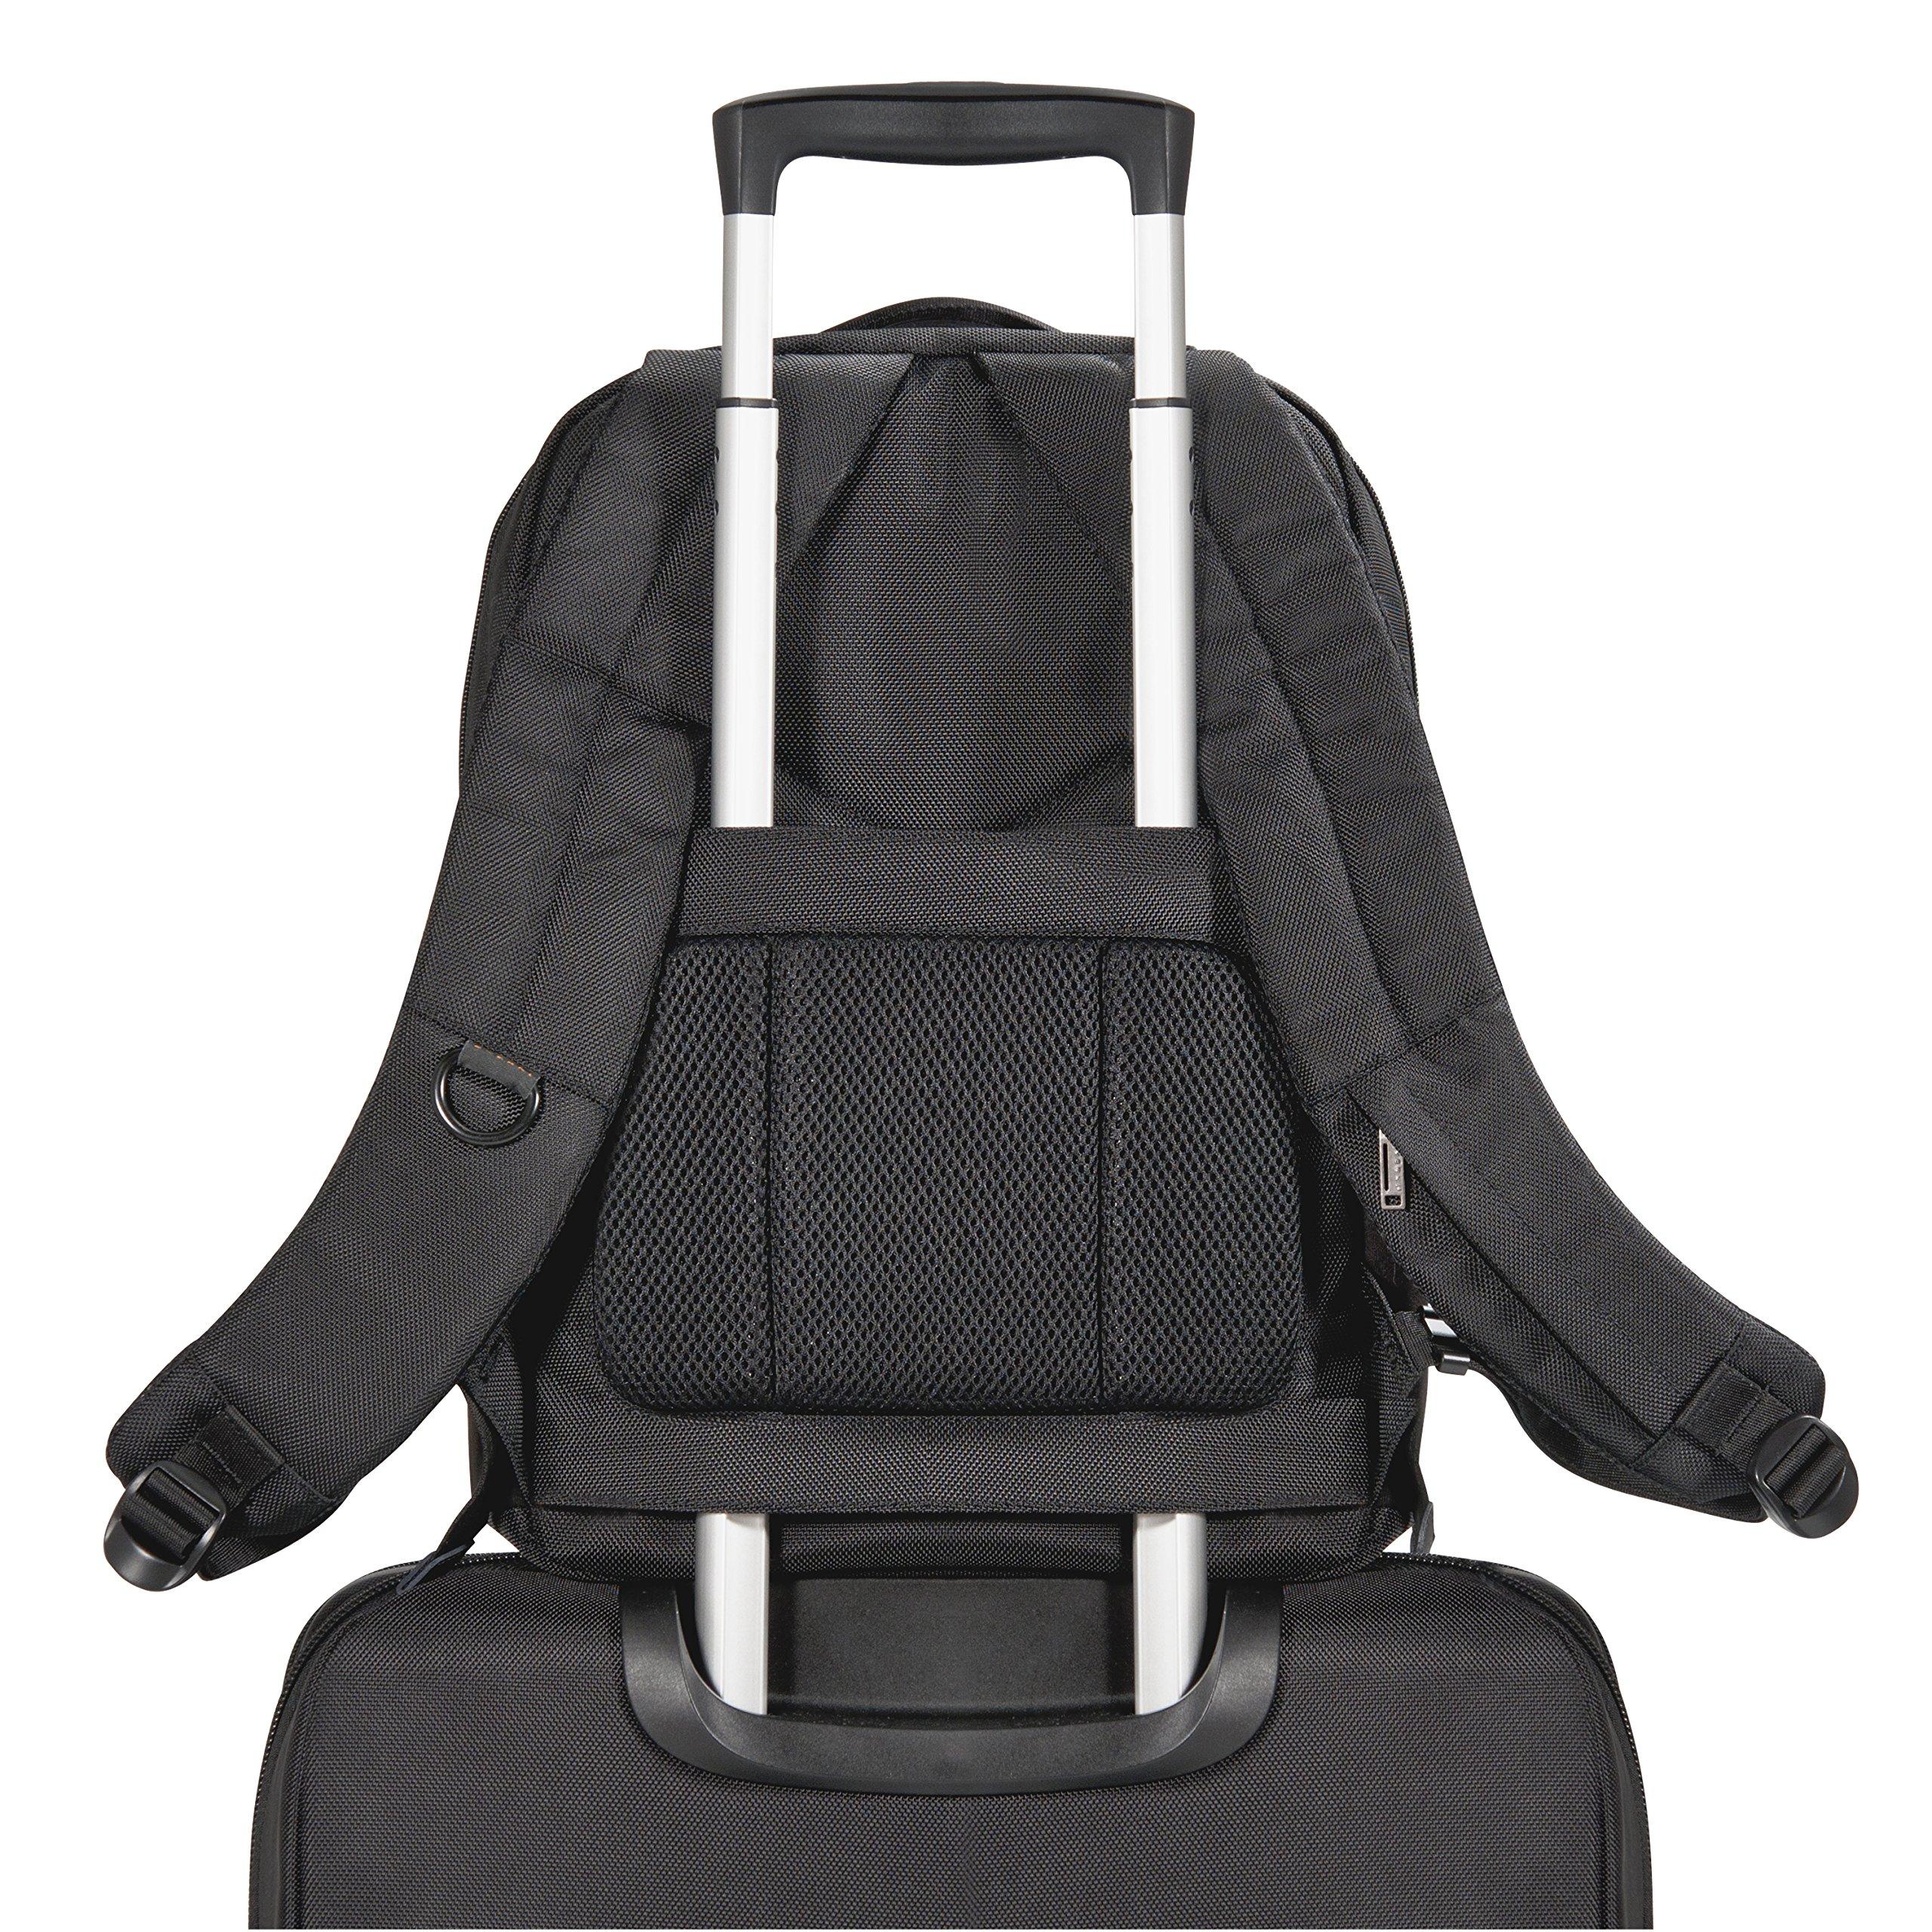 Everki Studio Slim Laptop Backpack for upto 14.1-Inch Laptops/15-Inch MacBook Pro (EKP118) by Everki (Image #9)